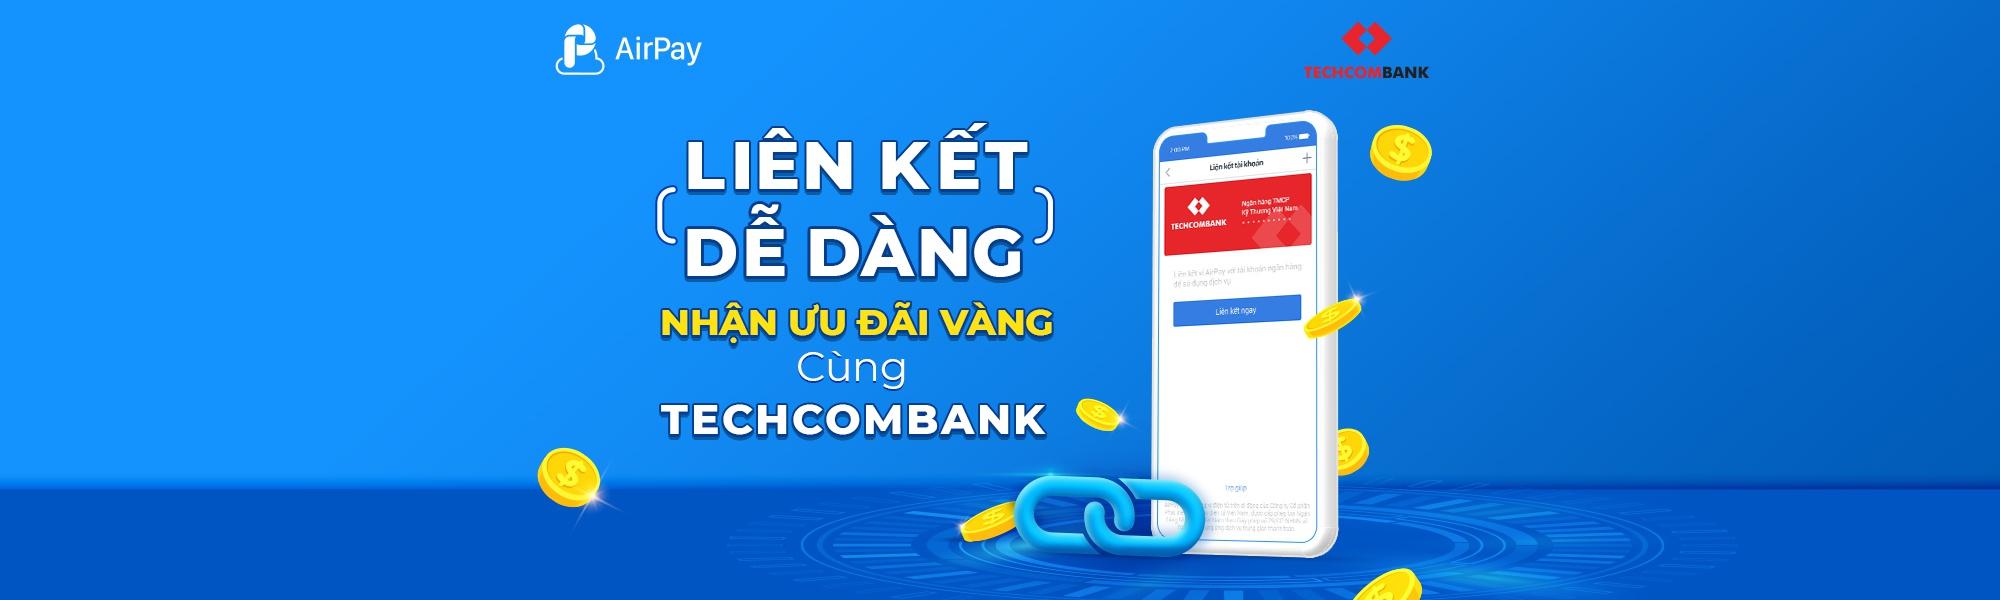 lien-ket-de-dang-nhan-uu-dai-vang-cung-techcombank